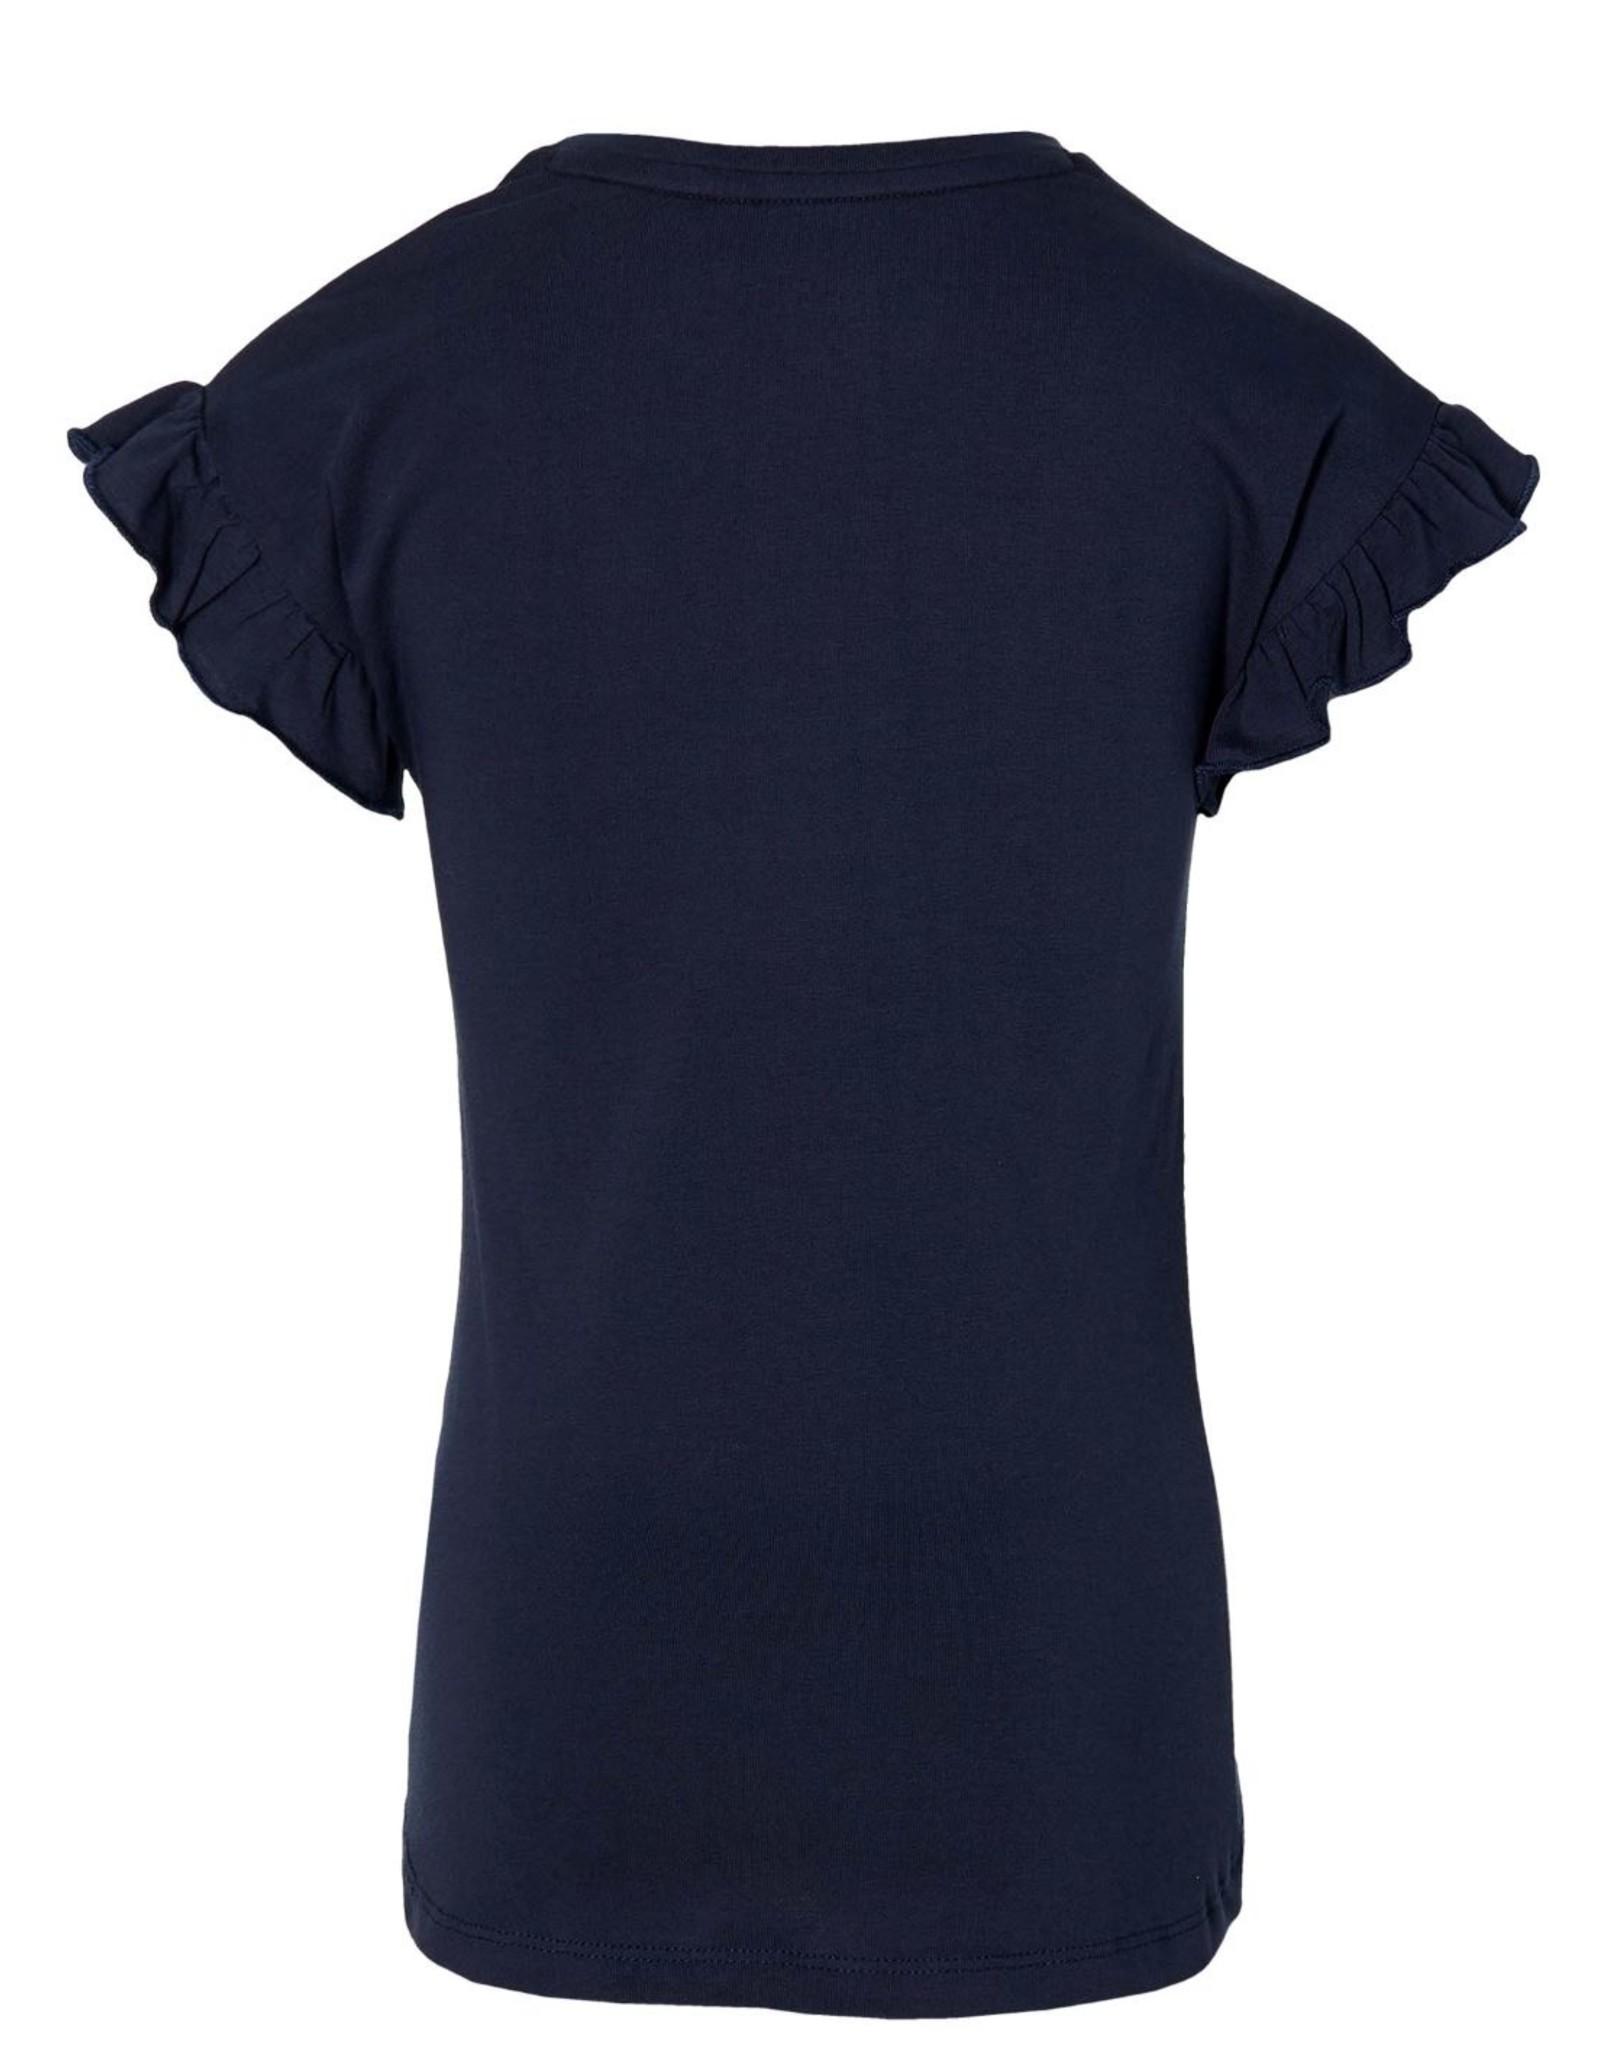 Quapi Quapi shirt Fenja dark blue